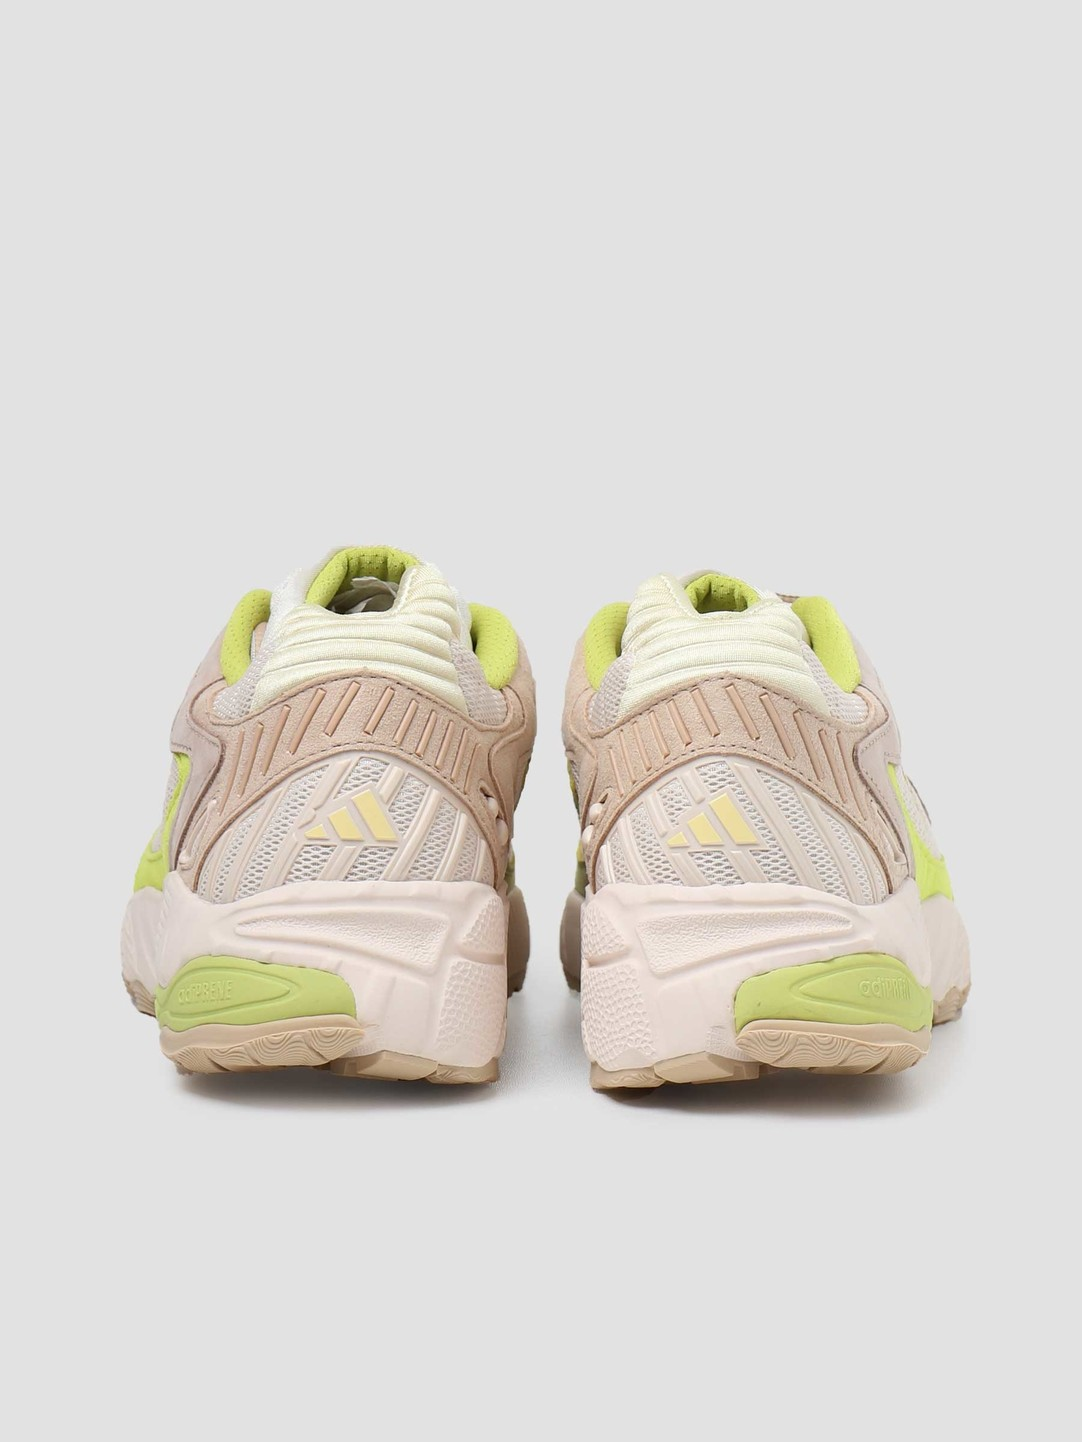 adidas adidas Torsion TRDC Linen Pale Nude Half Green